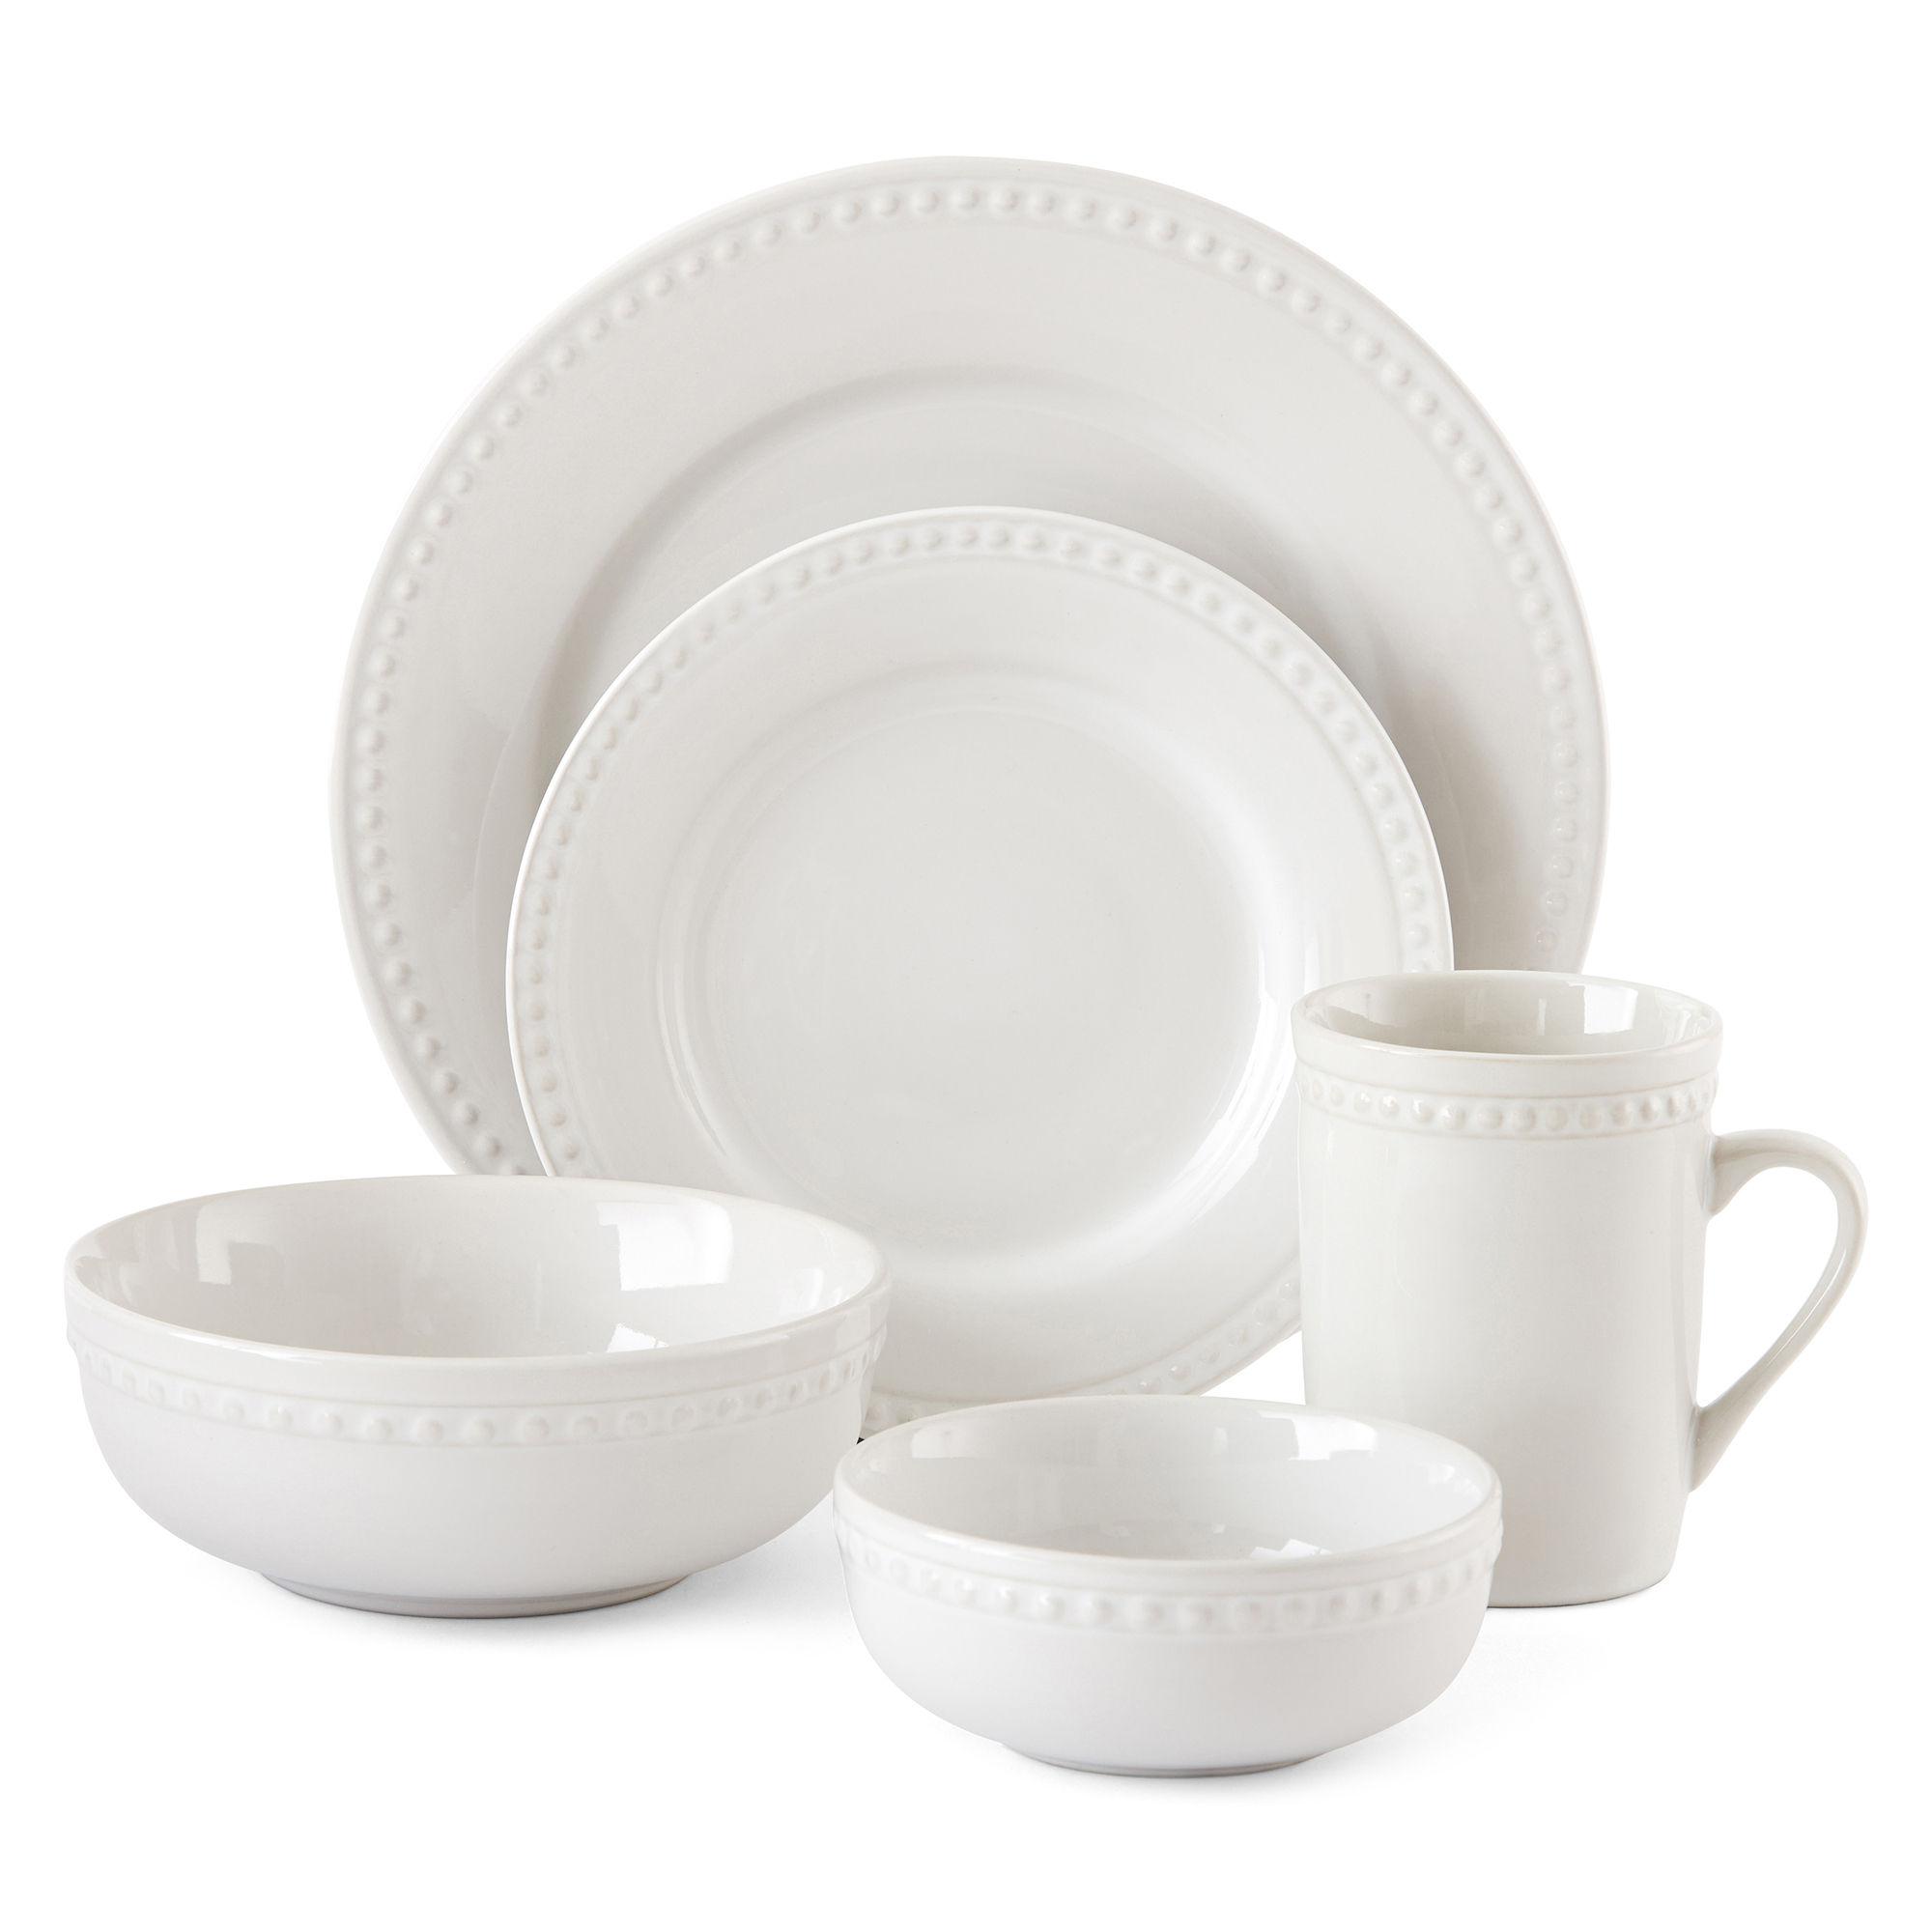 Best deals dinnerware sets